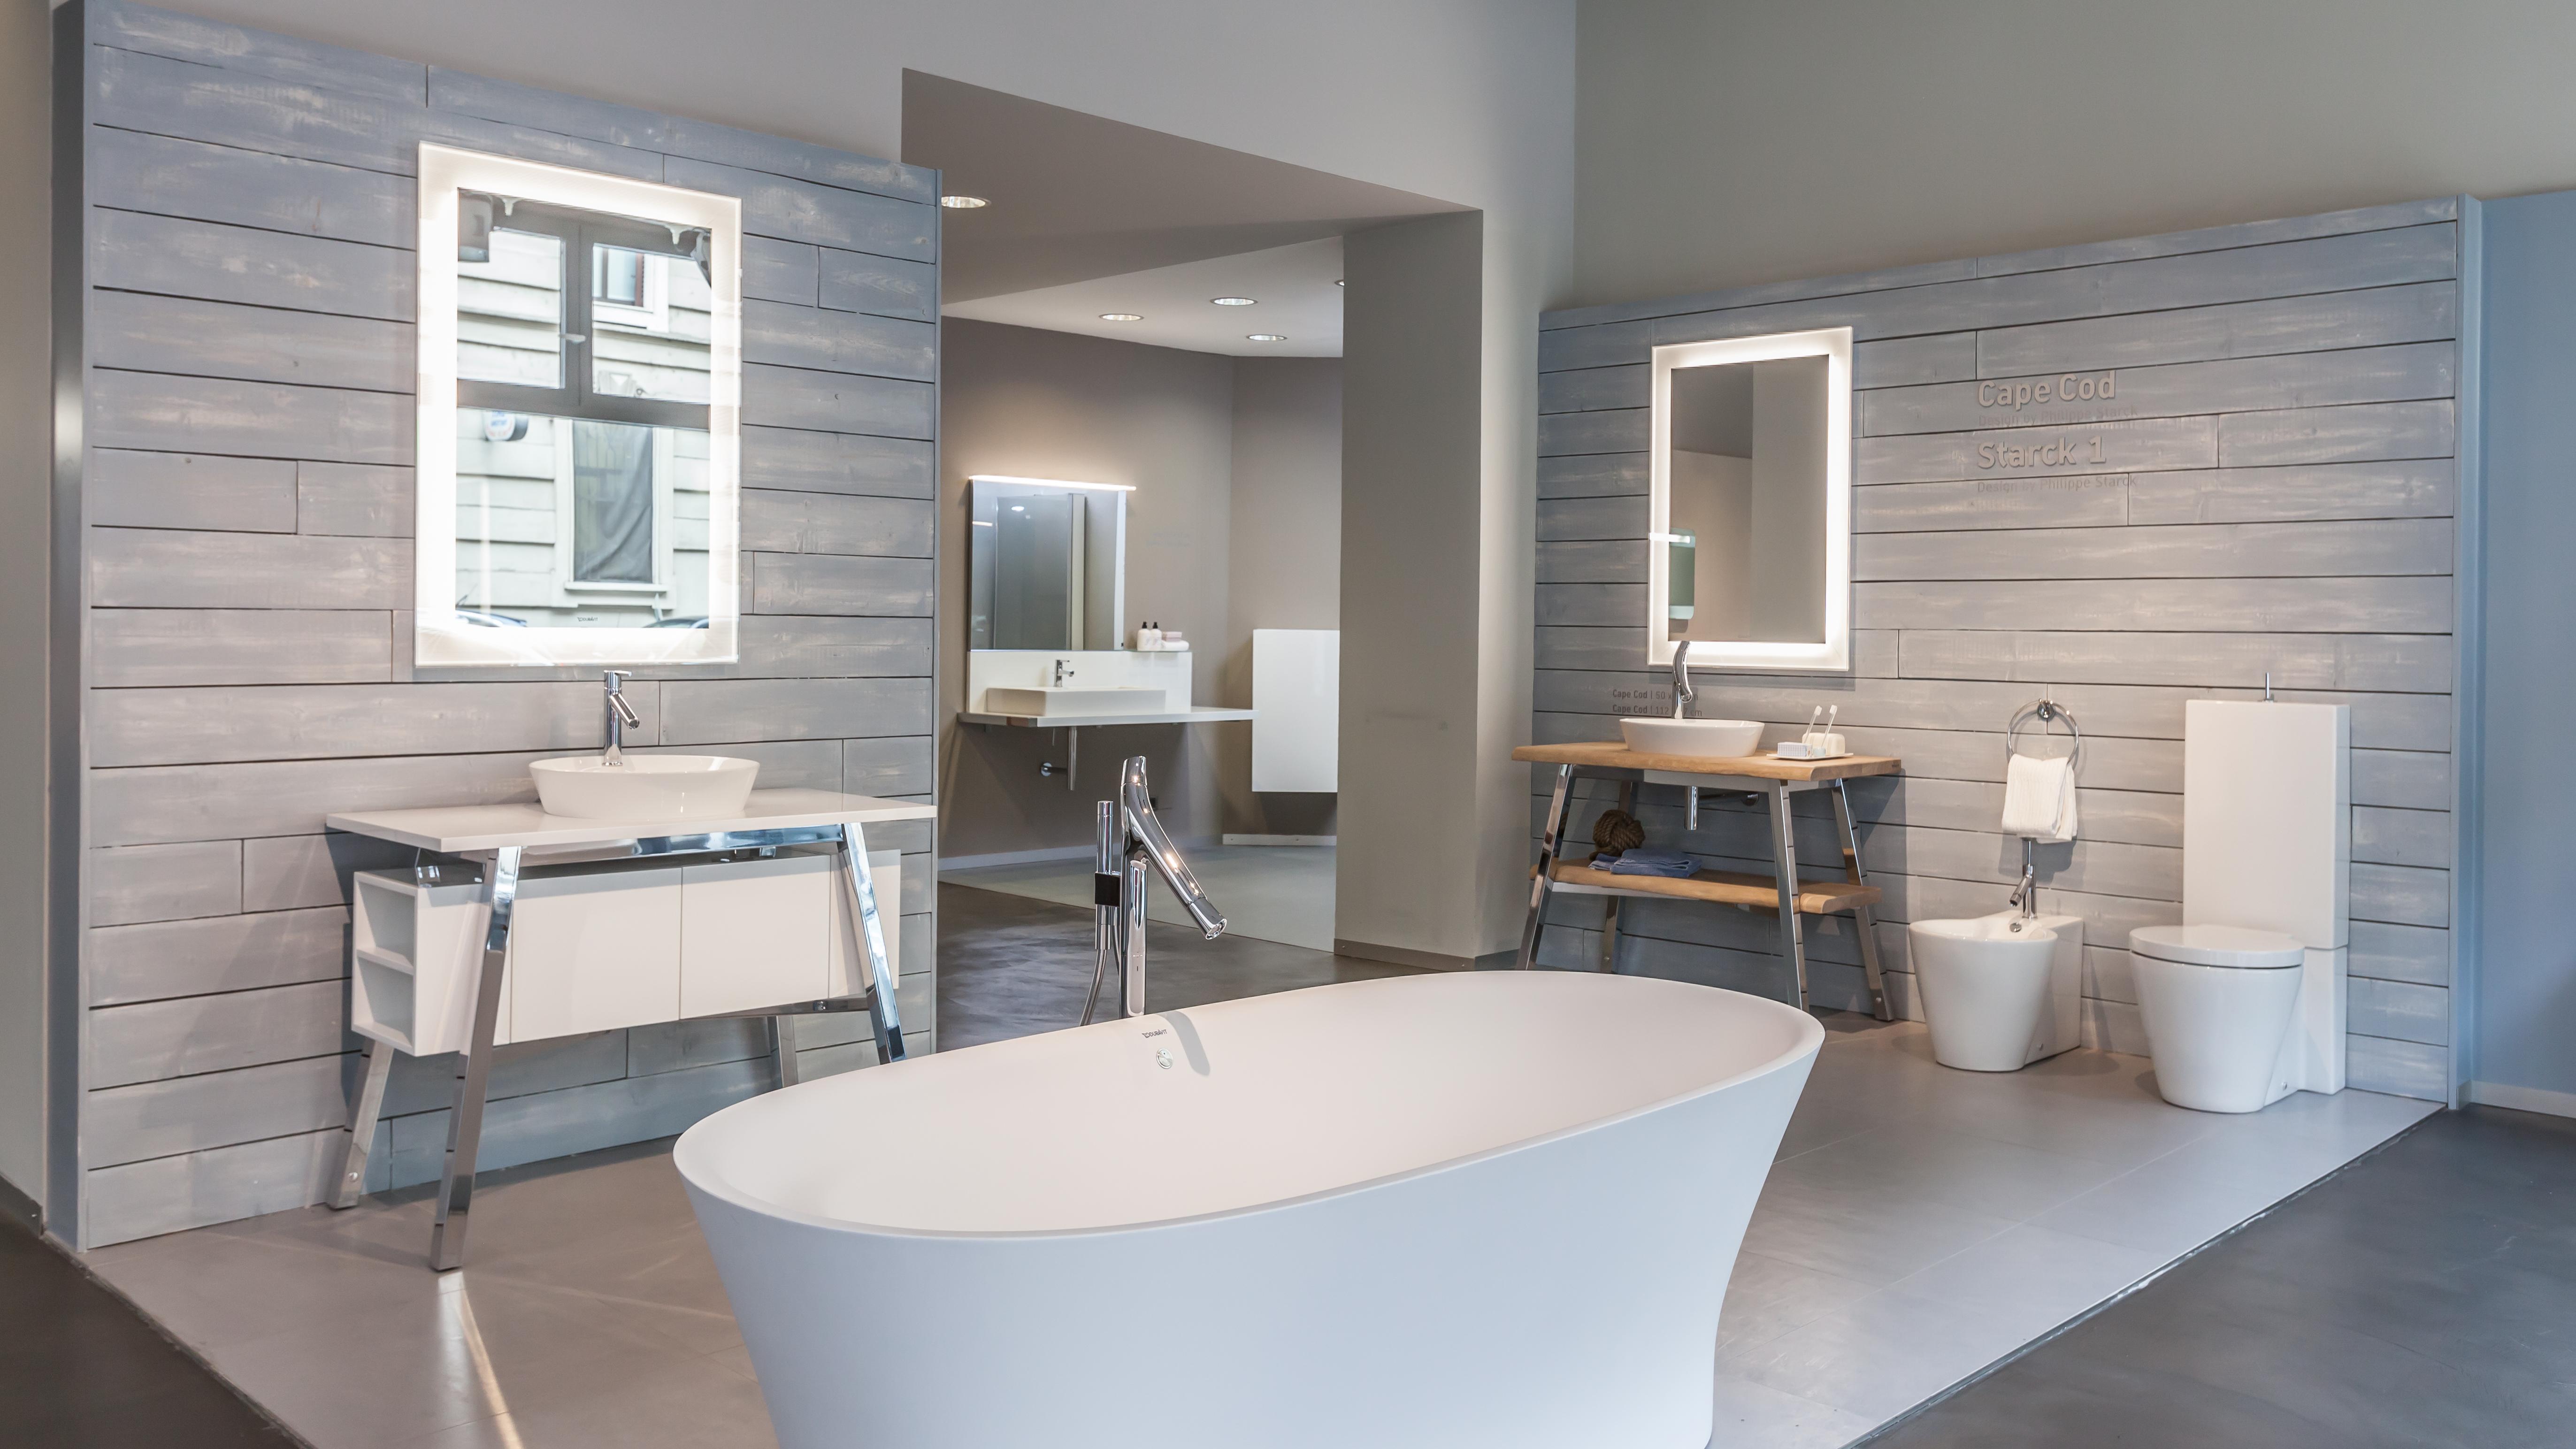 crescent fashion your decor with pittsburgh home baths bathroom bathtub ultimate create kitchens showroom tub